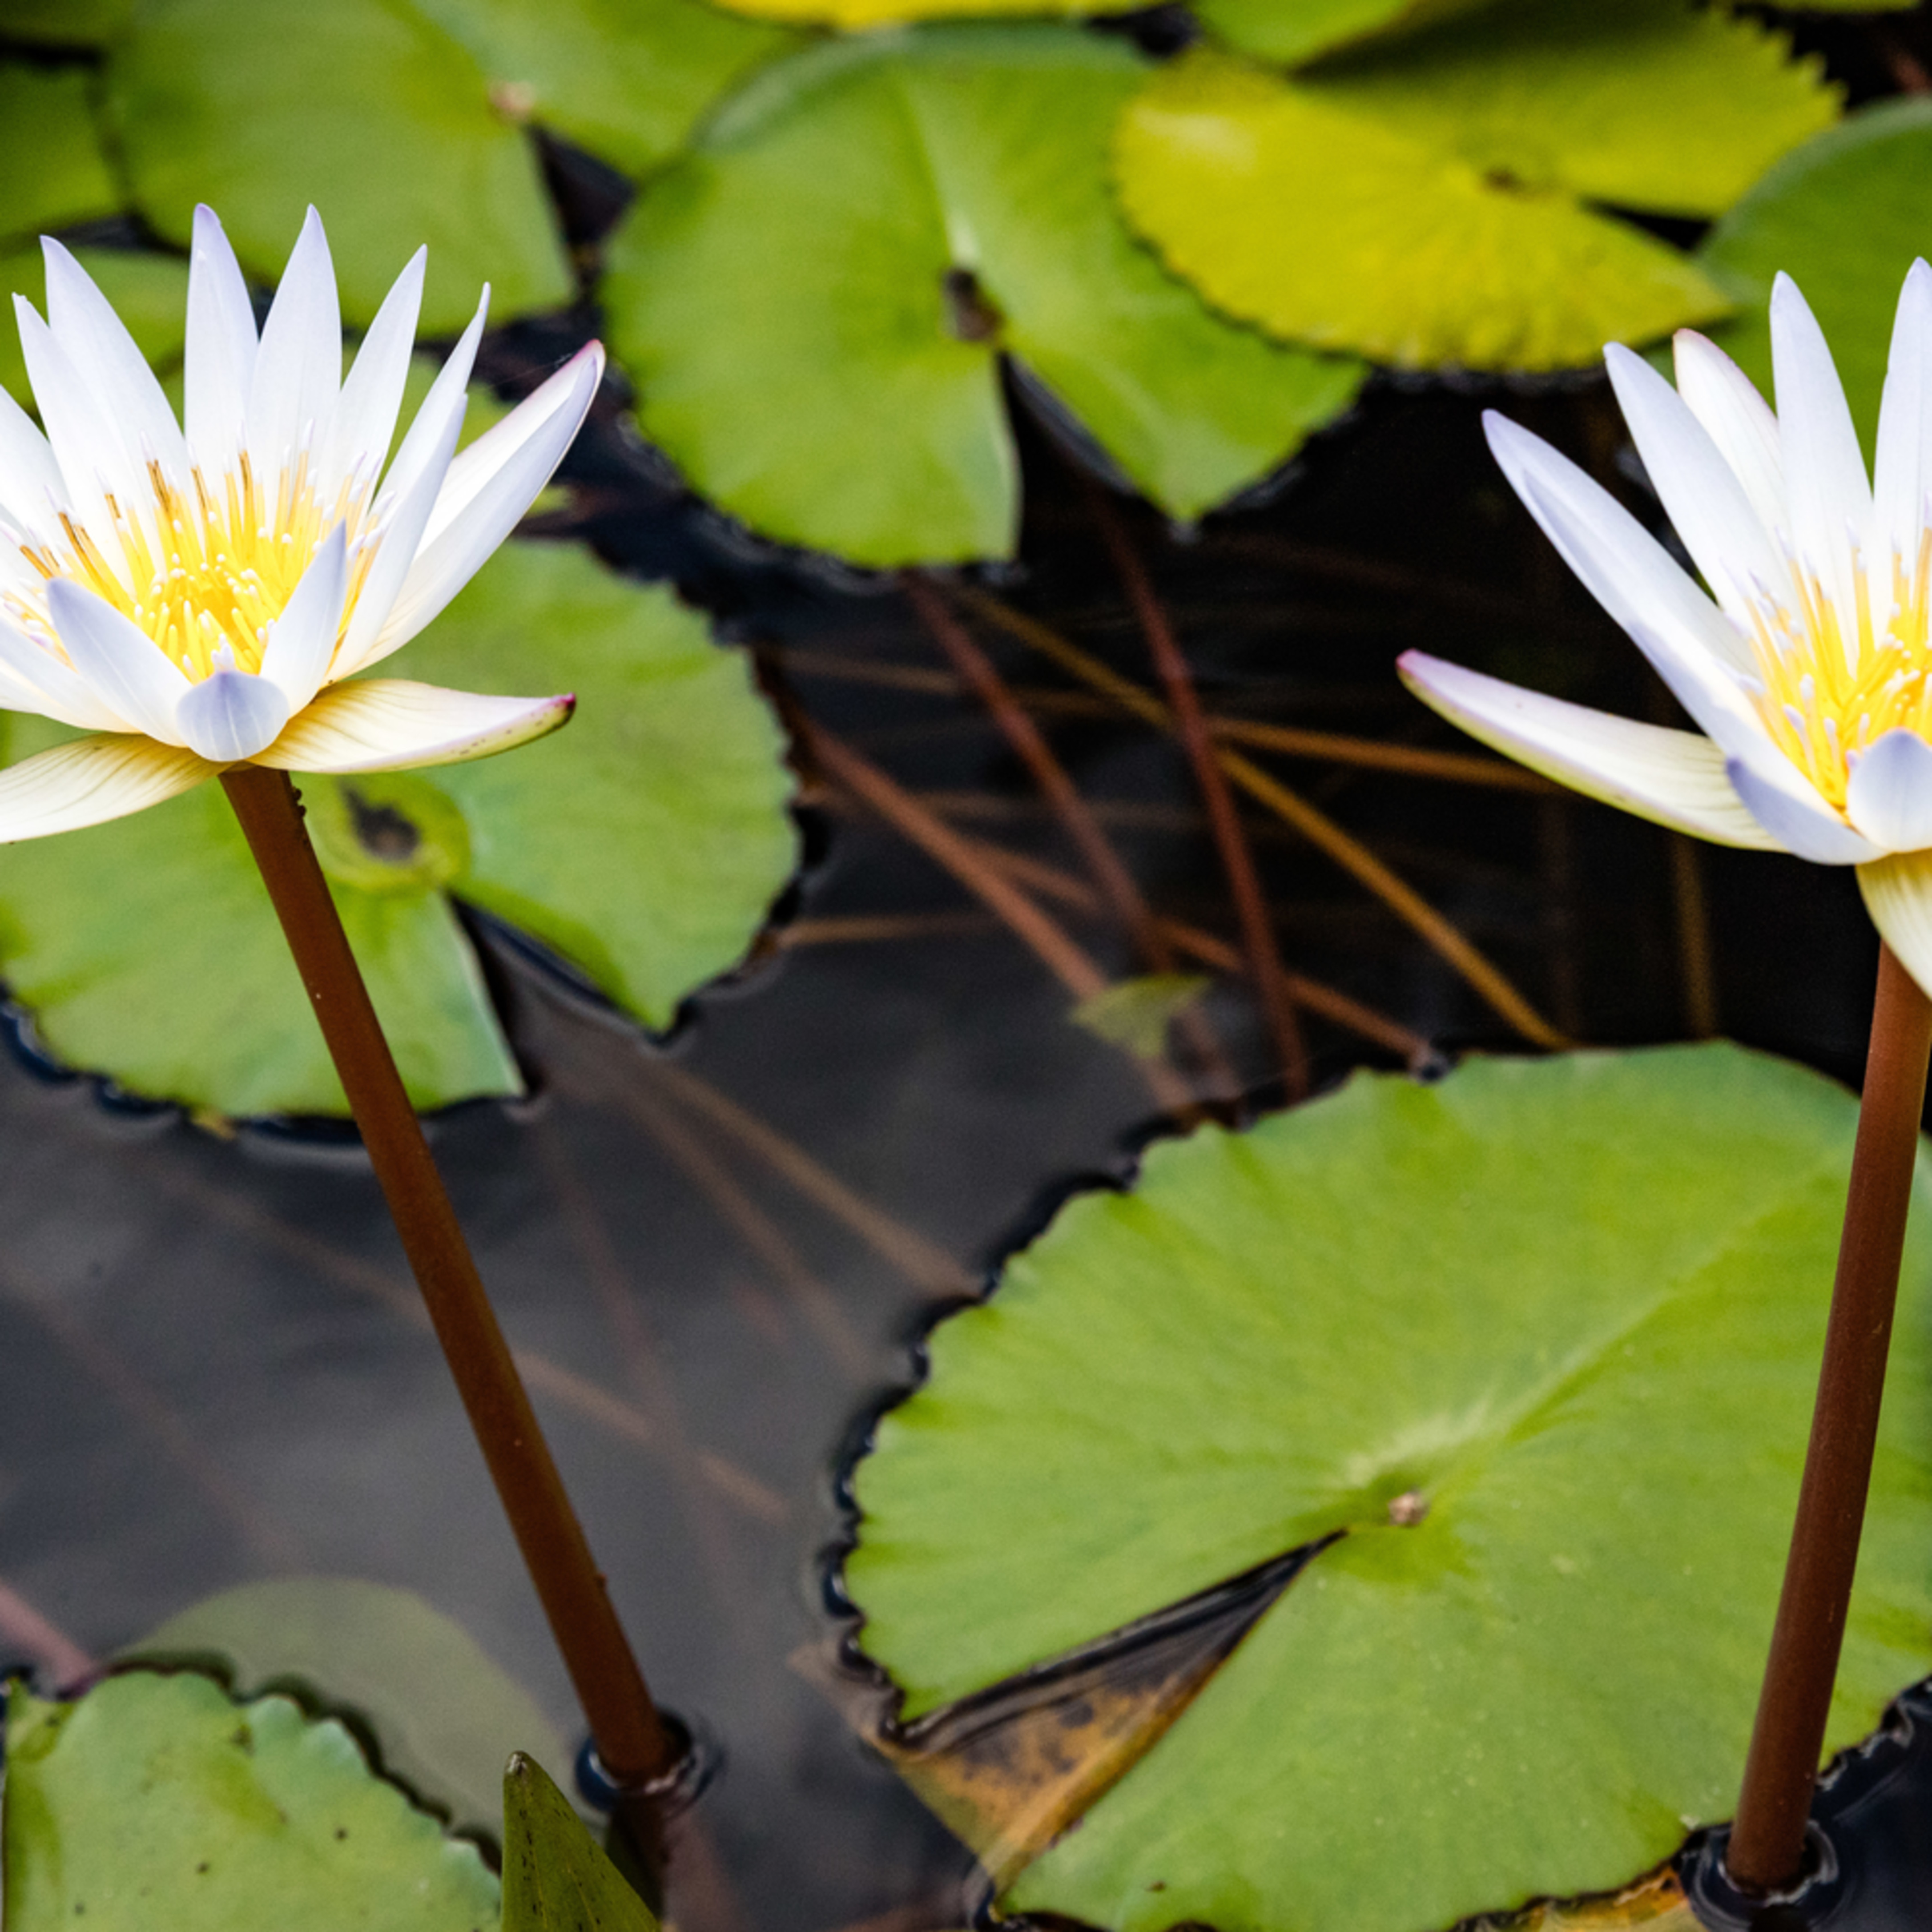 Lily lily mevtcf